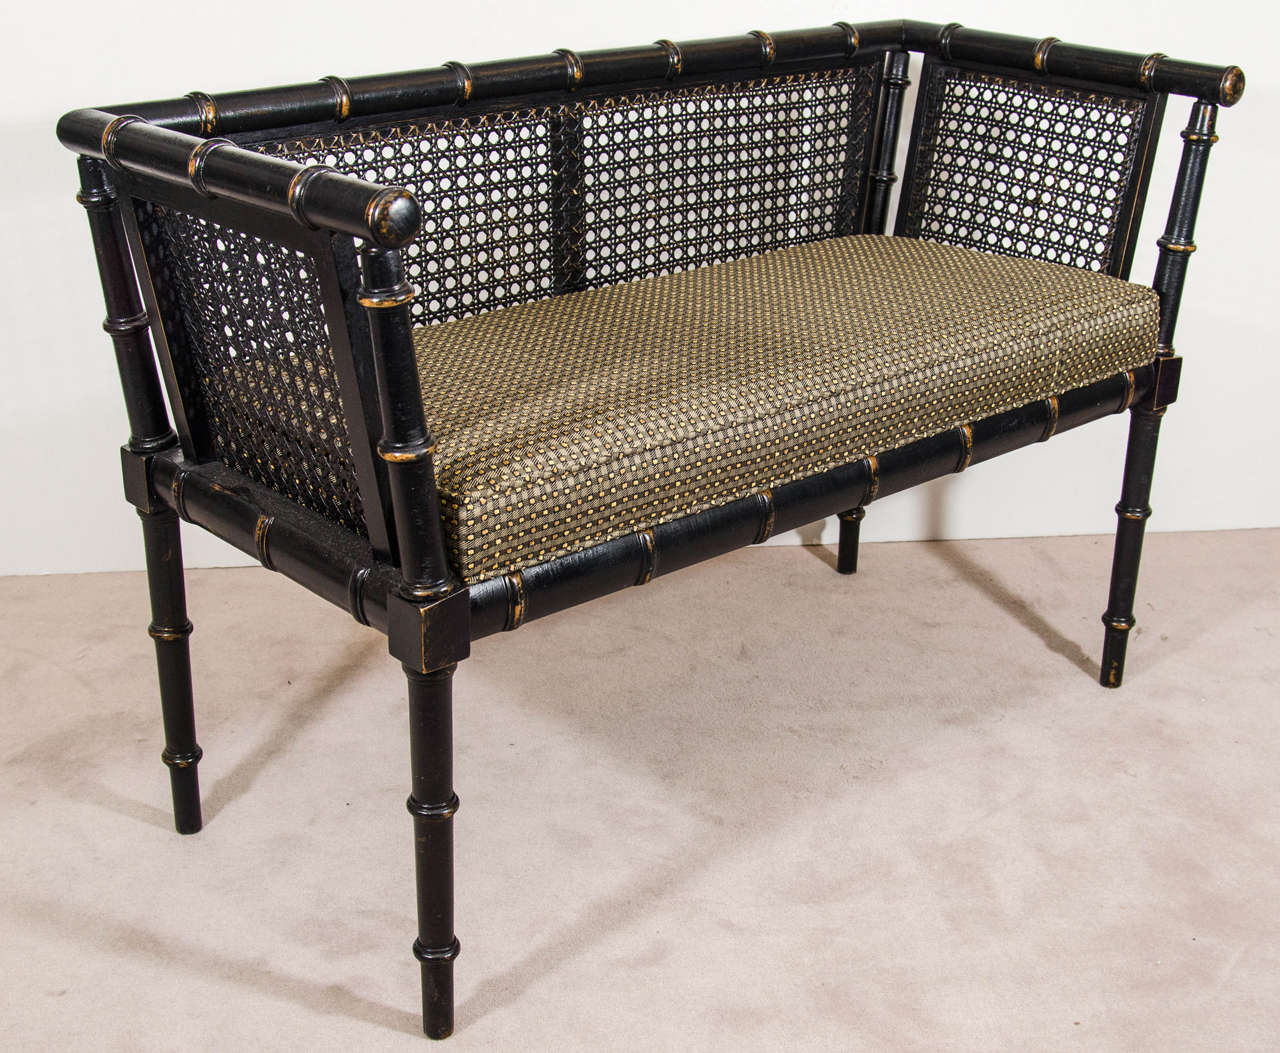 midcentury faux bamboo bench in original black finish at stdibs - midcentury faux bamboo bench in original black finish